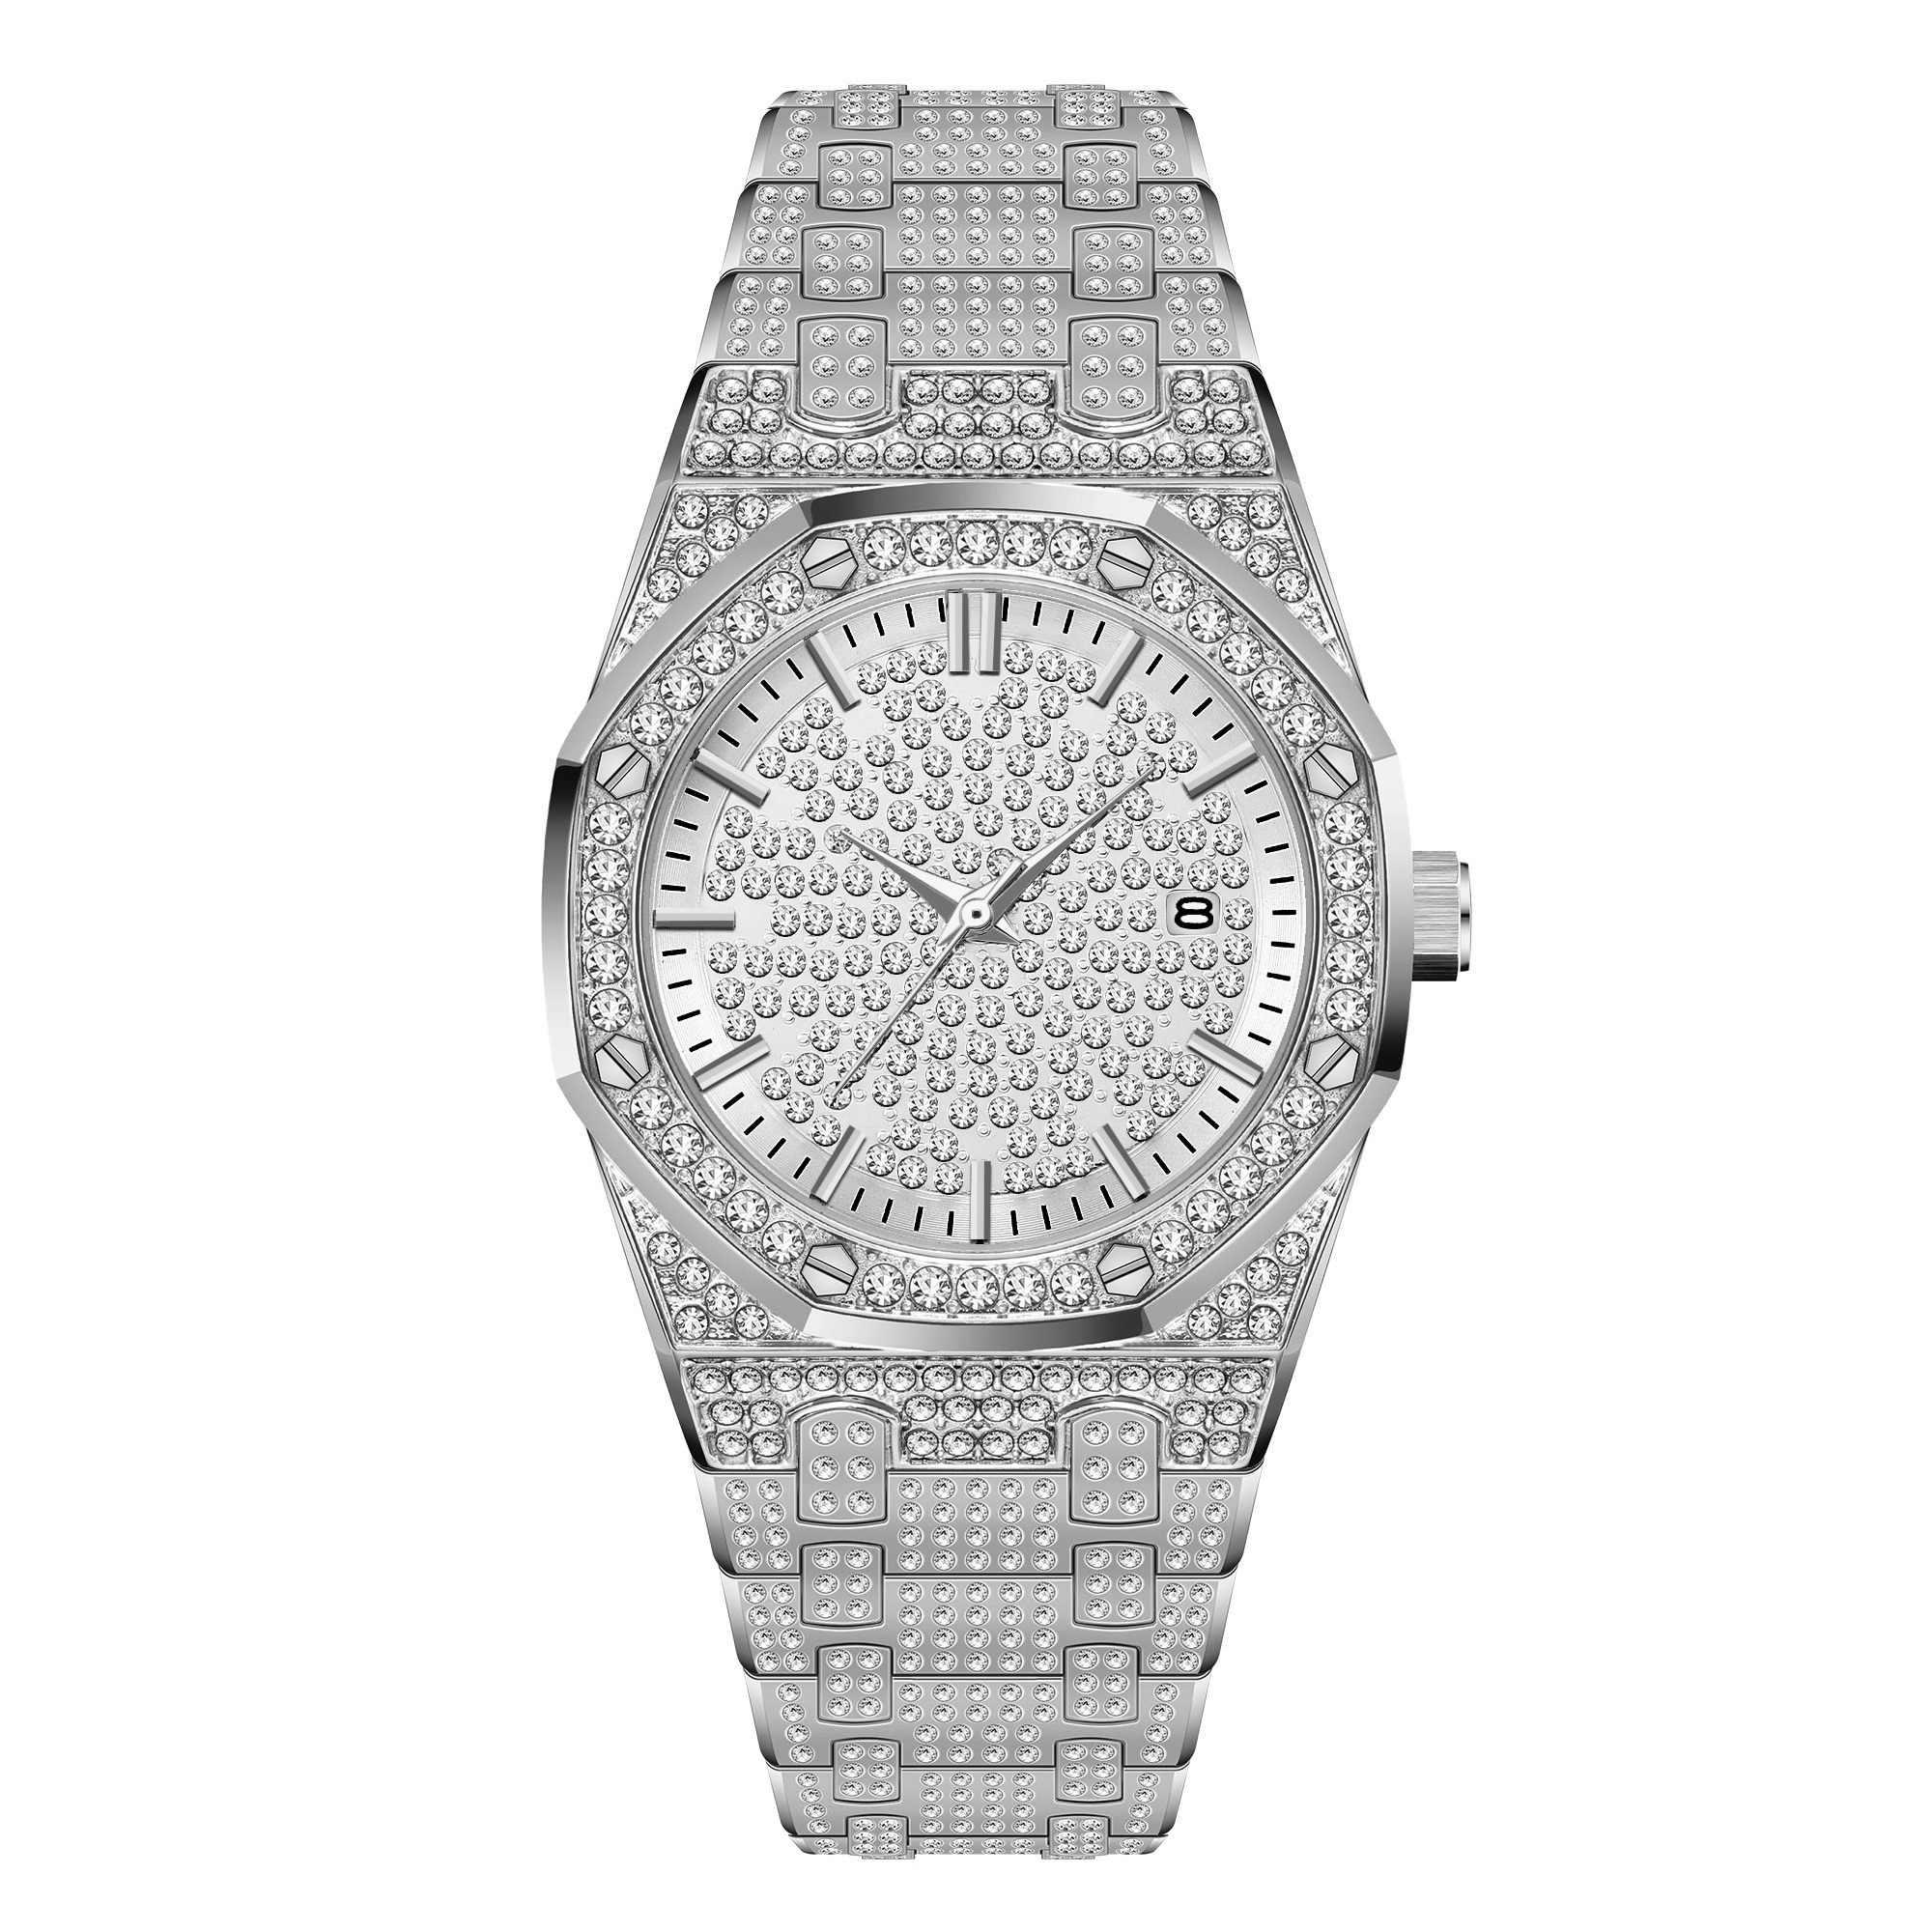 50a74e98eb93 MISSFOX de reloj de plata de las mujeres vestido Casual señoras reloj de  moda de acero